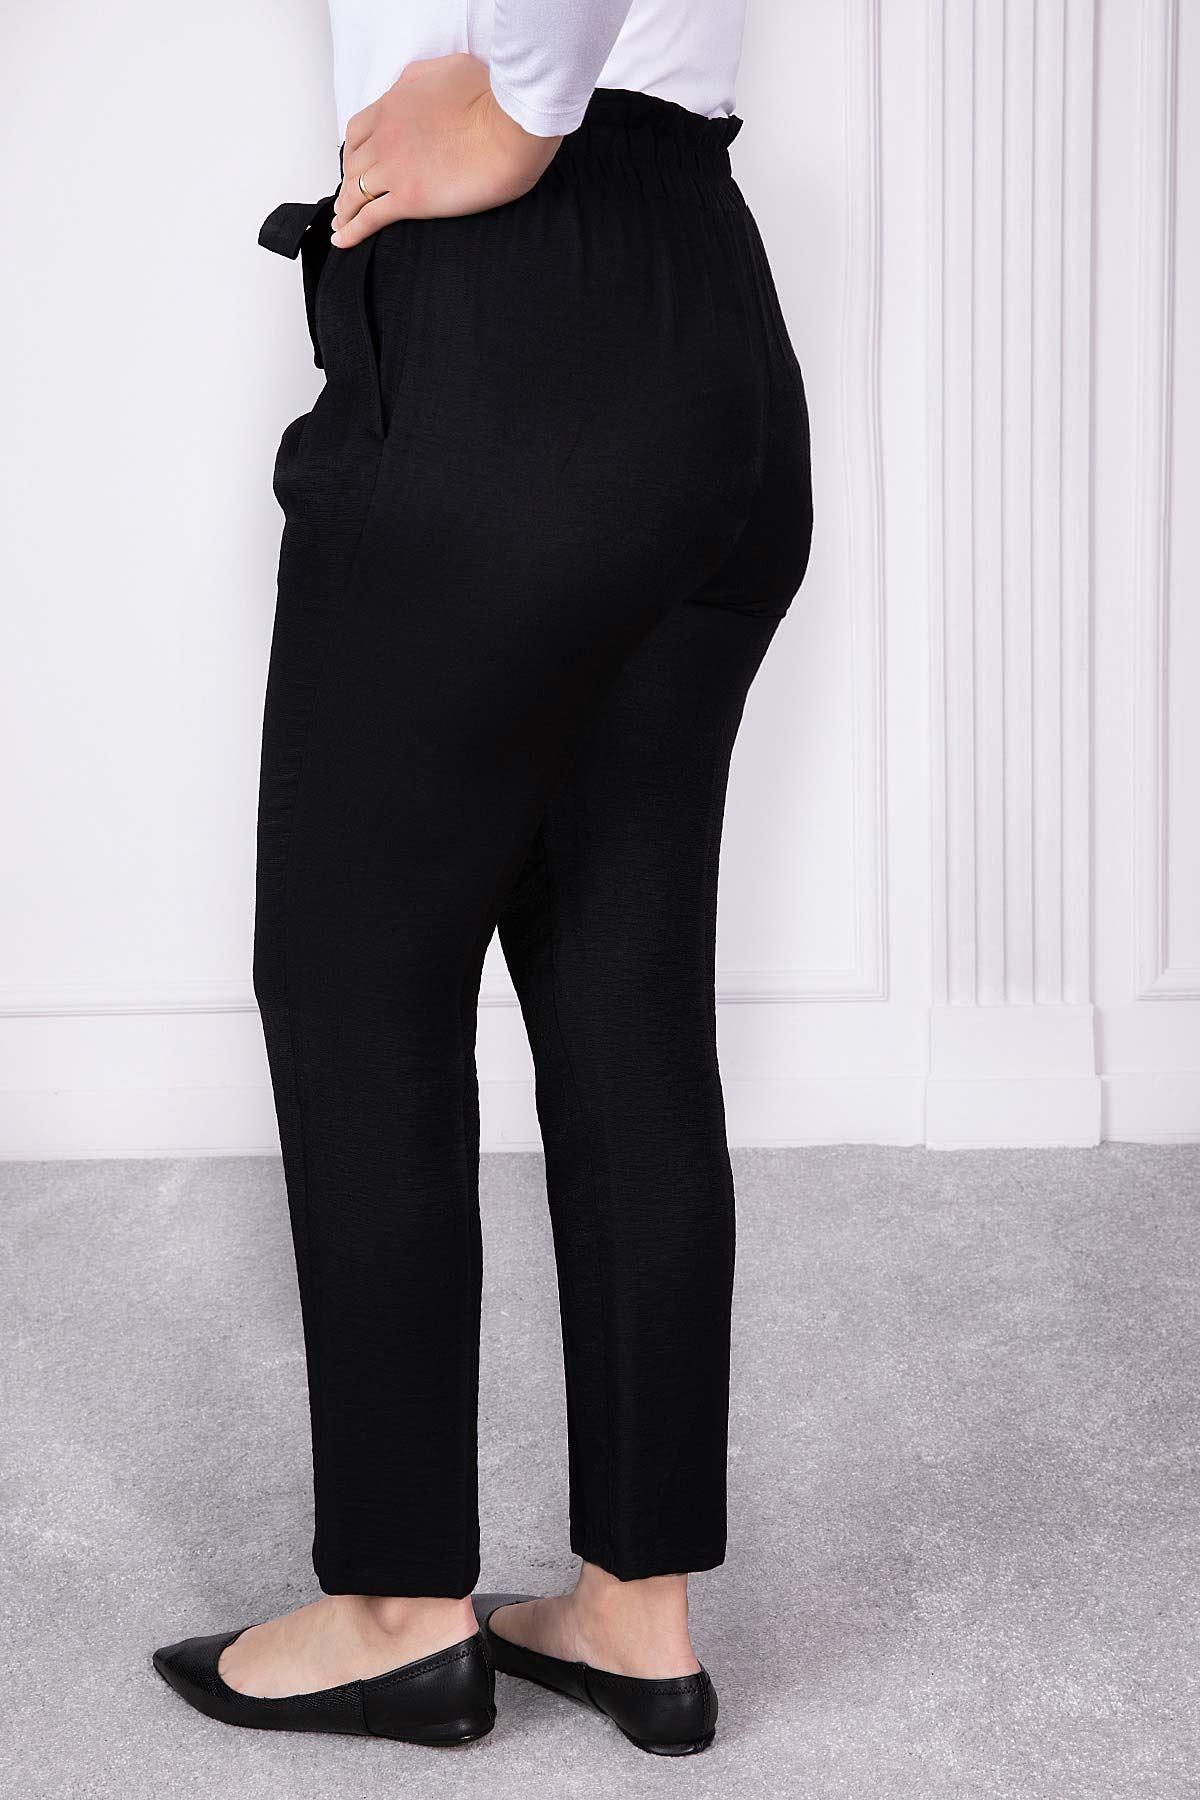 Kuşak Ve Lastik Detaylı Pantolon Siyah 1226-76